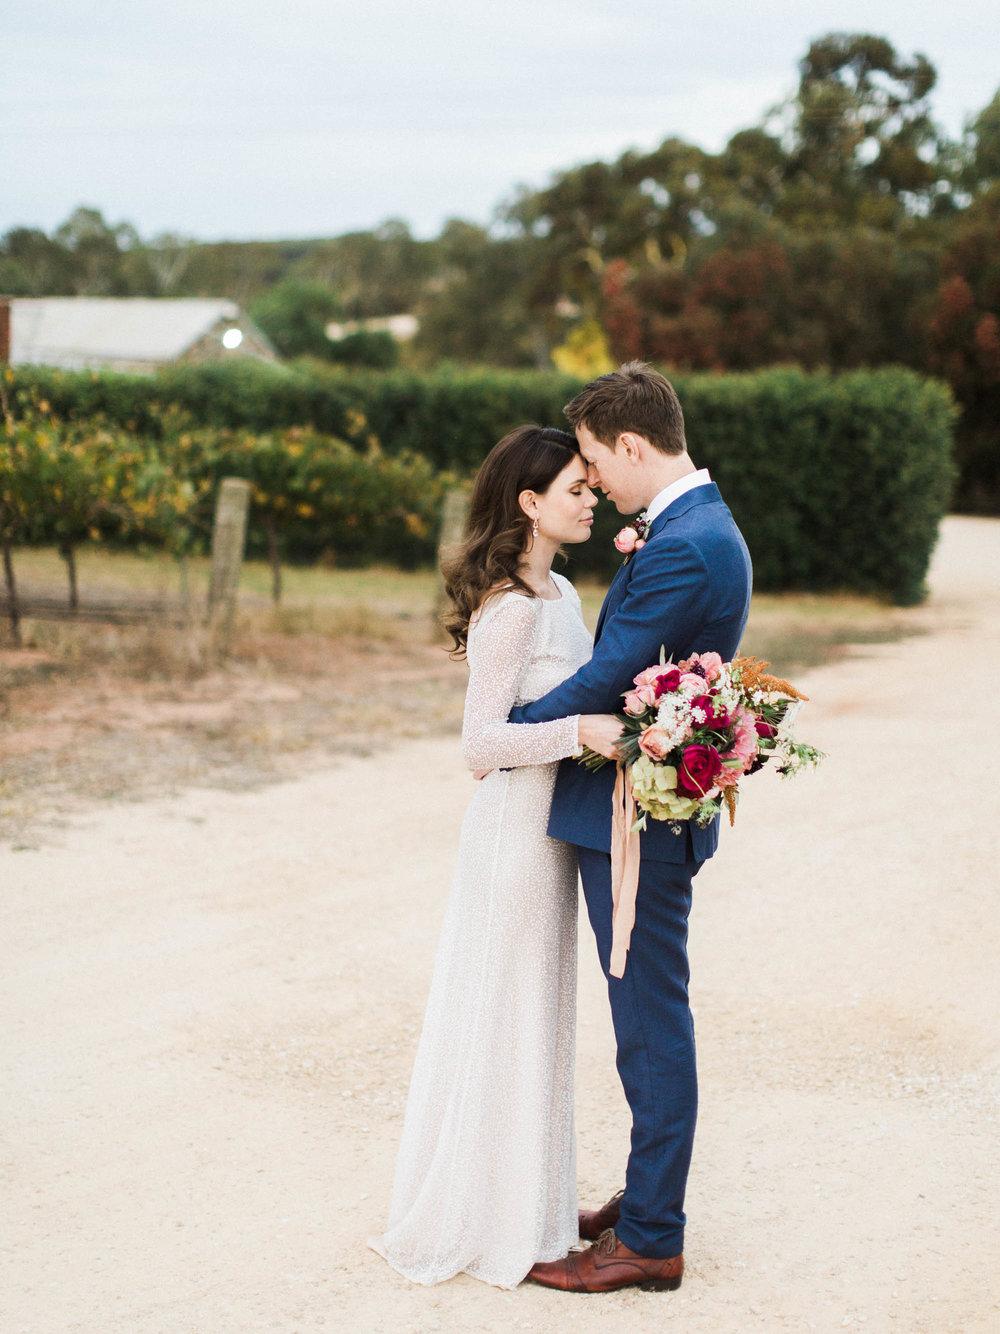 Hentley-Farm-wedding-photography-056.jpg